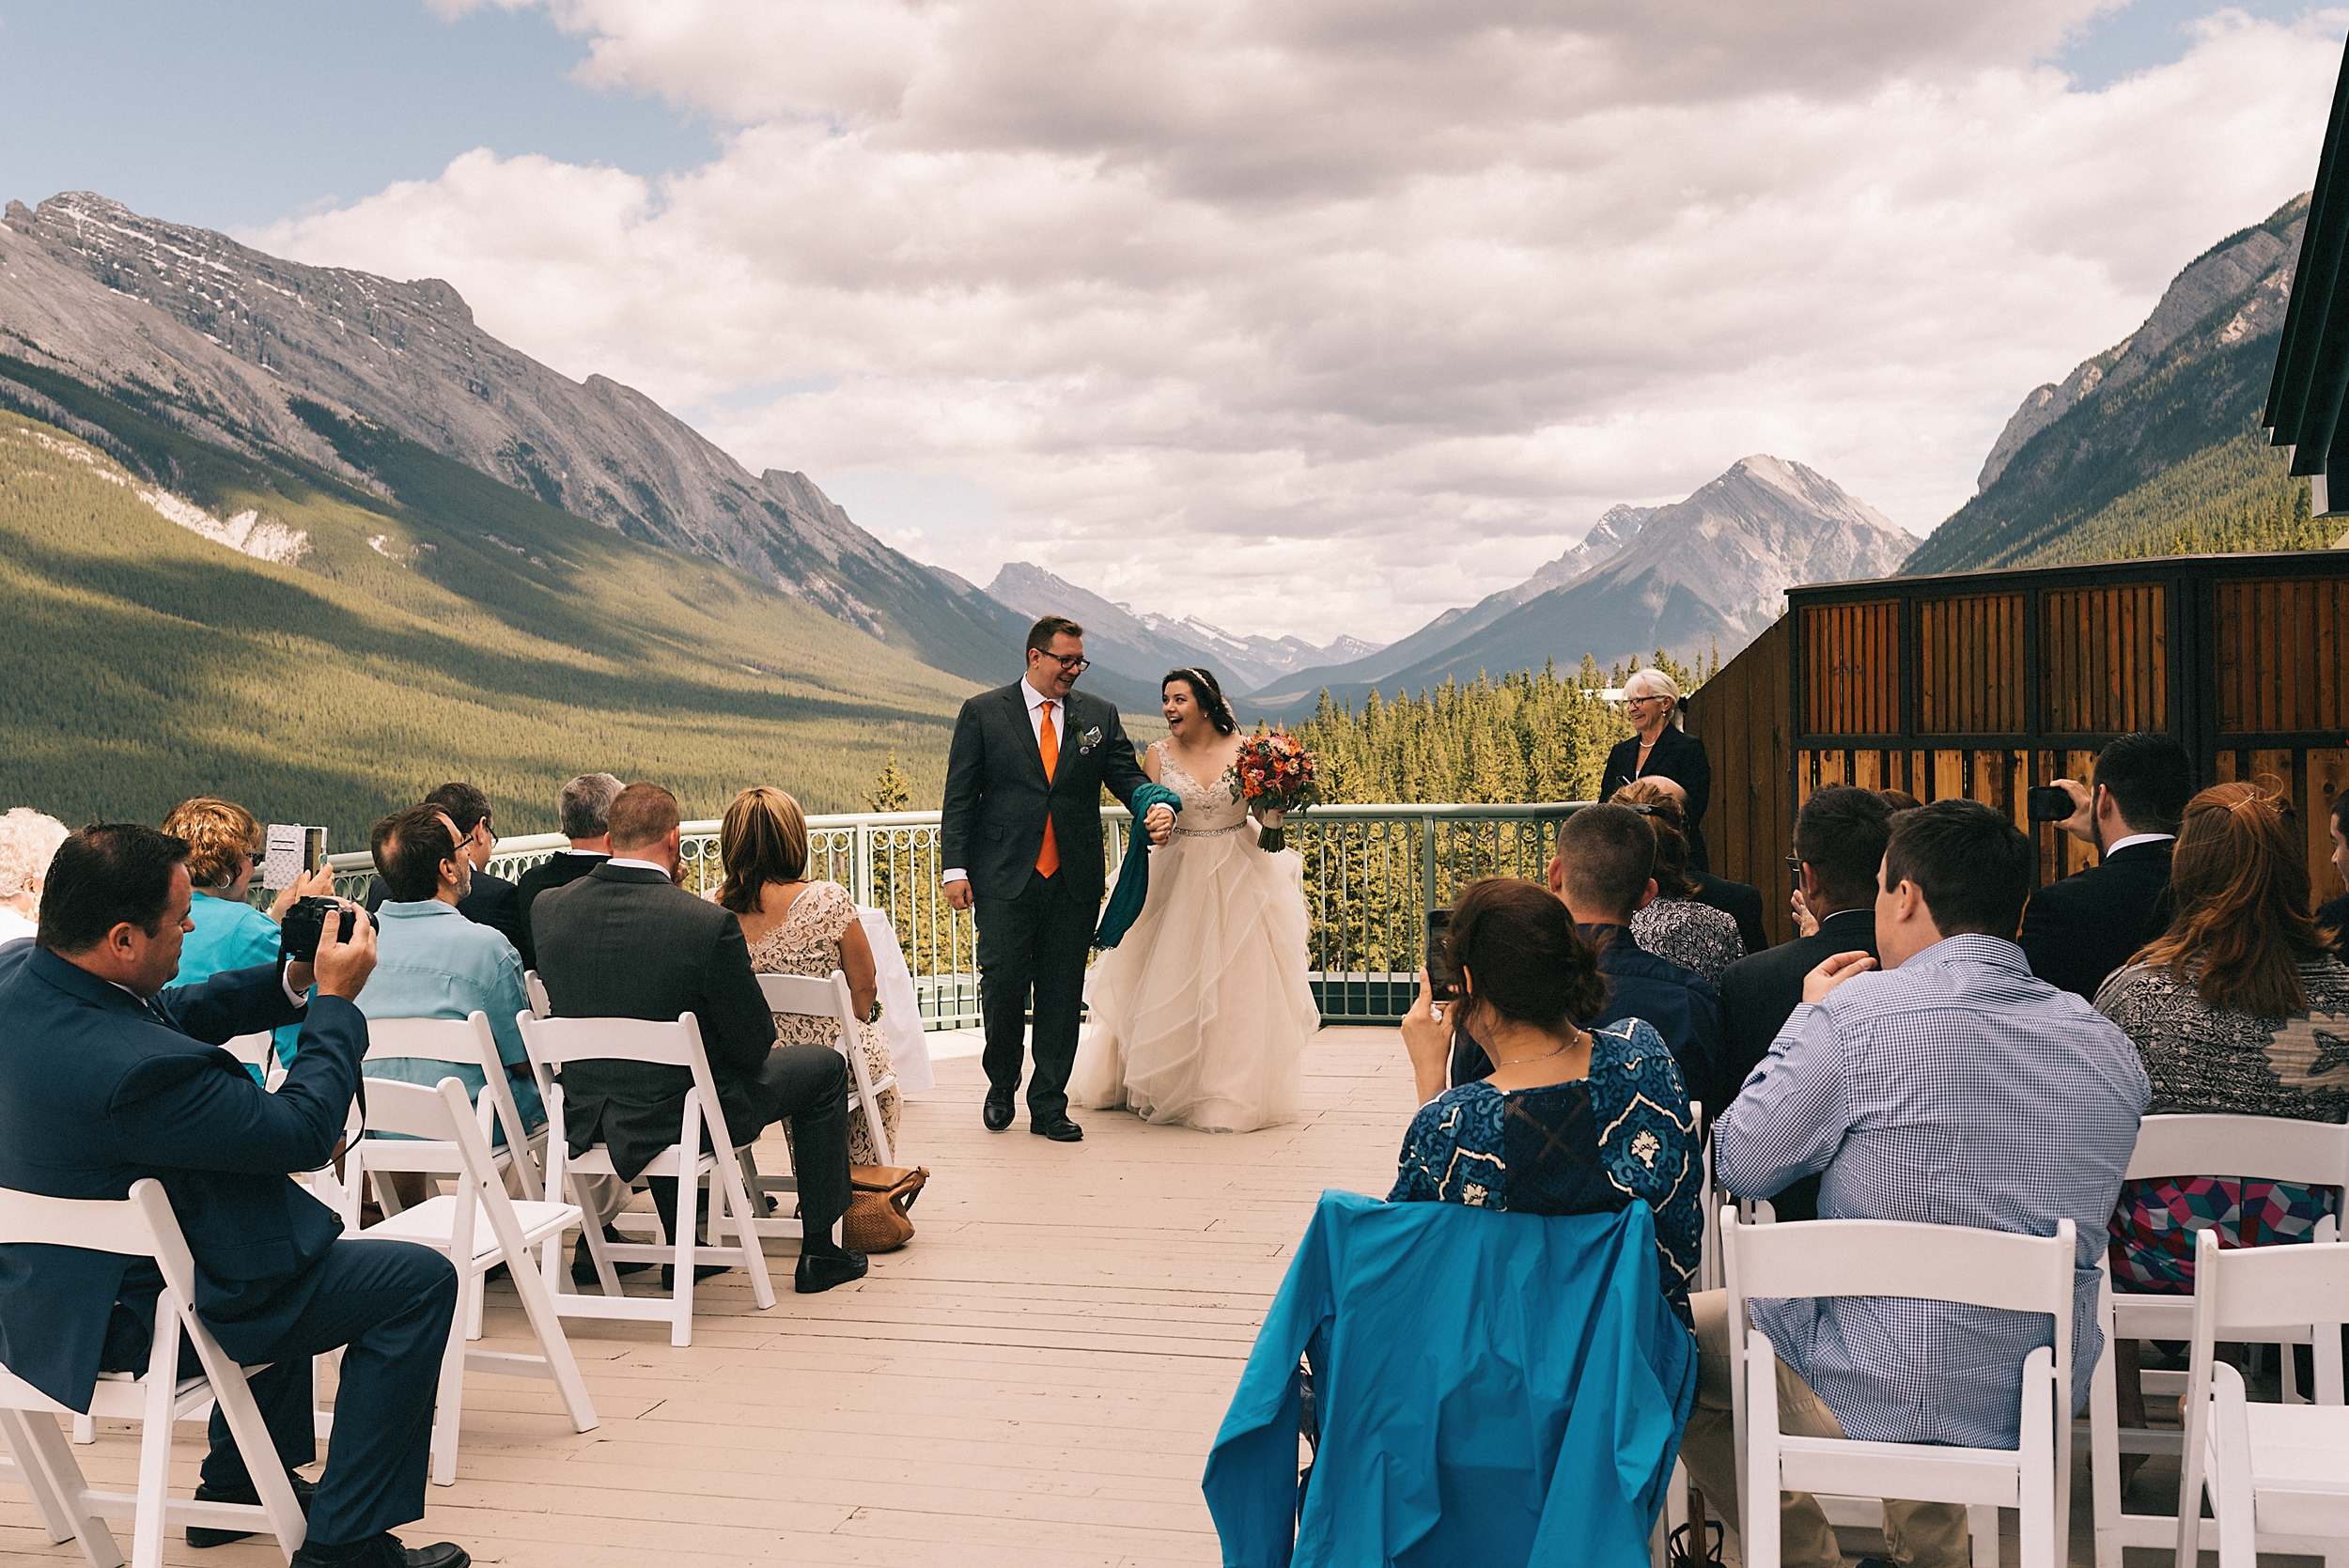 Banff Wedding Photographer - Destination Wedding Photographer - 13